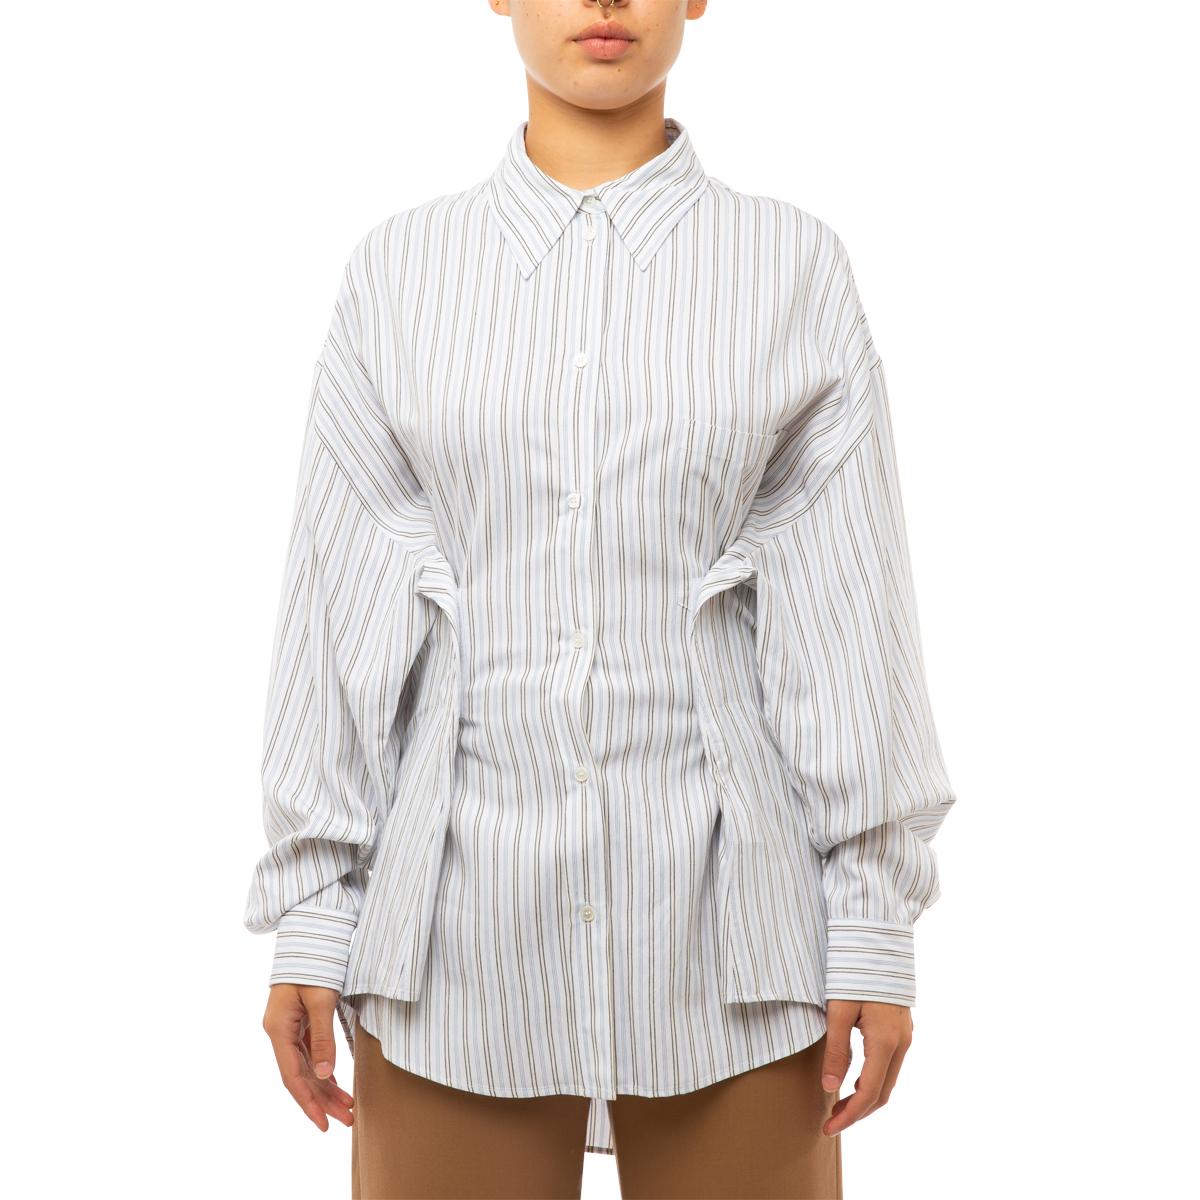 MM6 Maison Margiela Striped Viscose Shirt